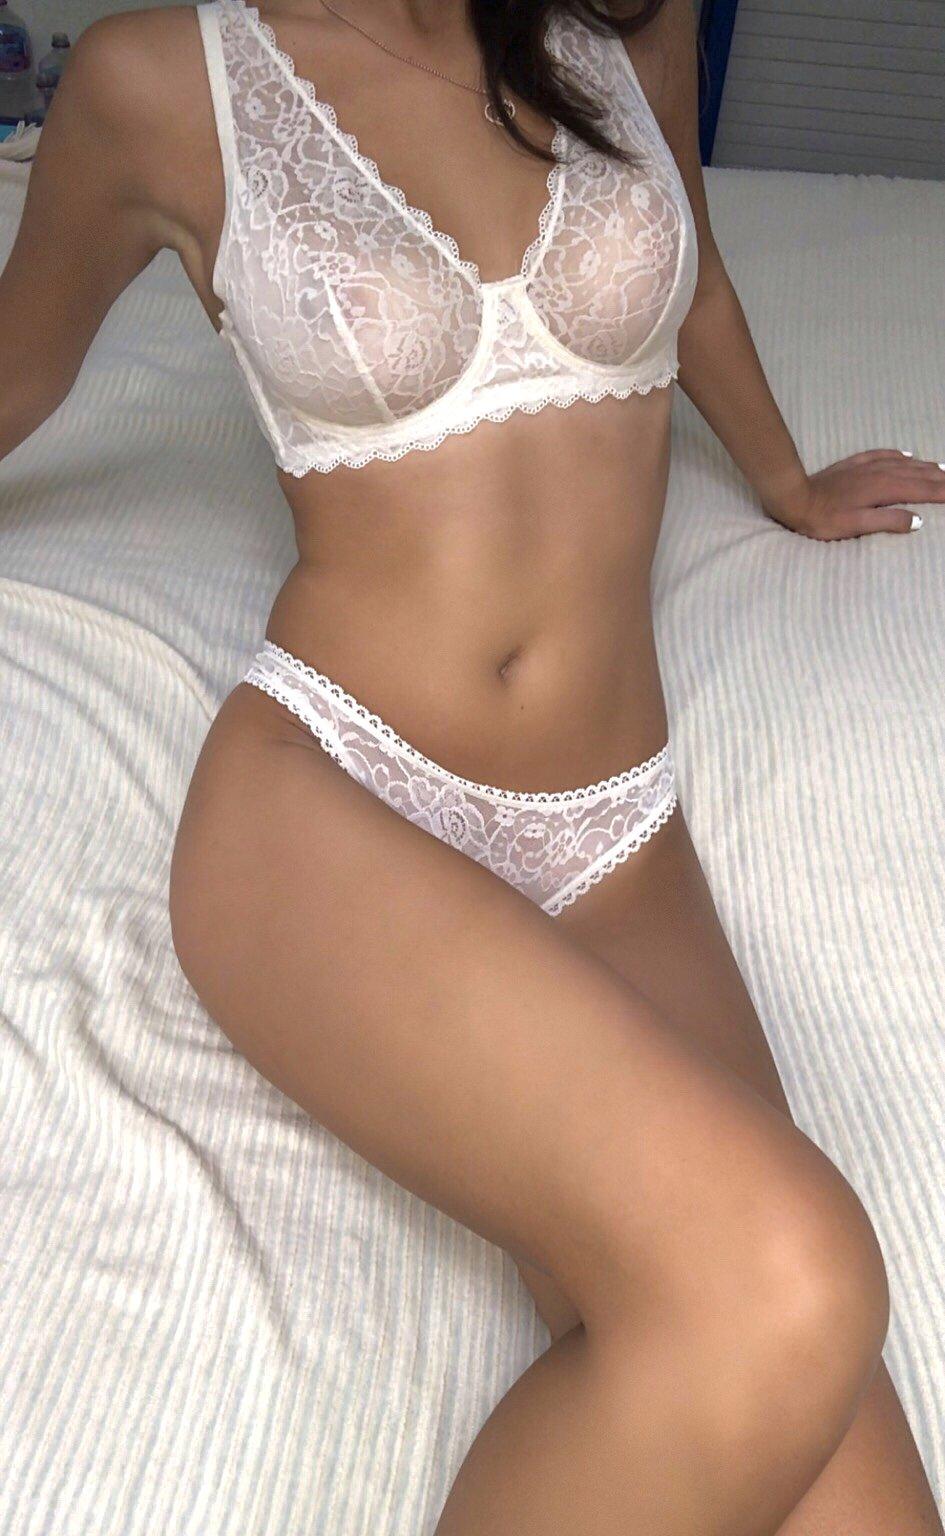 Larasex22hot at StripChat